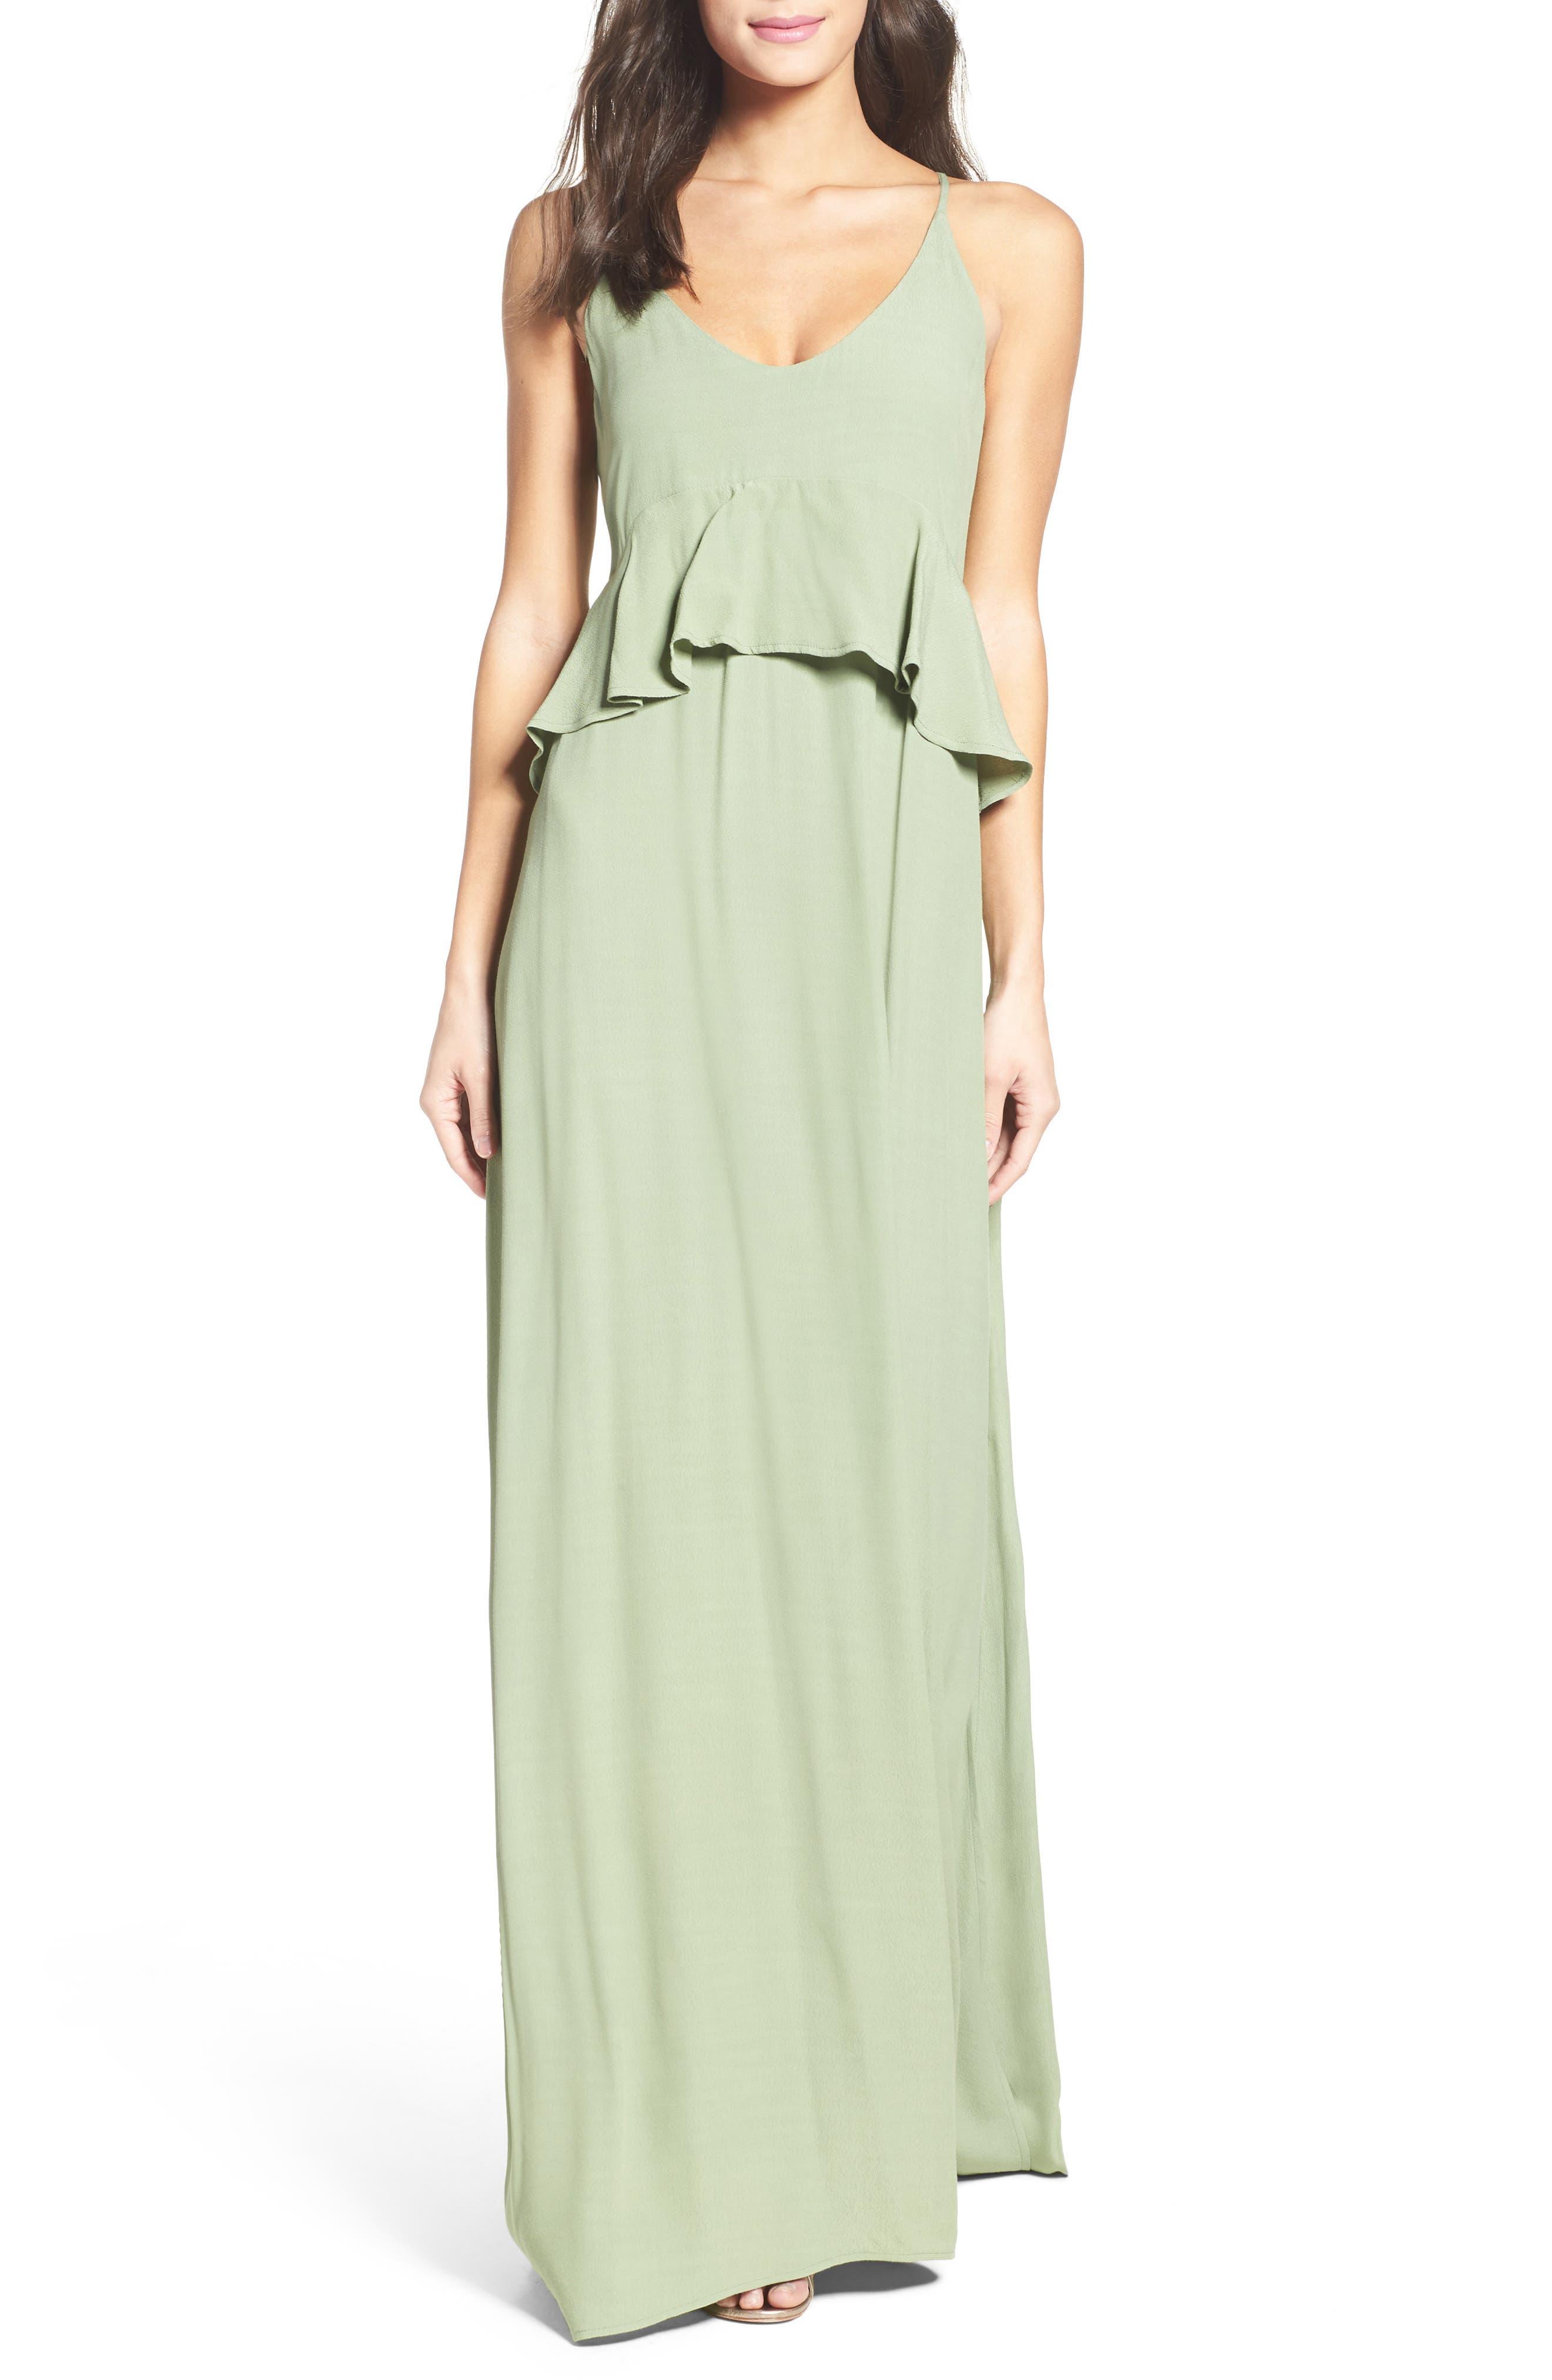 Roe + May Jolie Crepe Peplum Dress,                             Main thumbnail 1, color,                             Sage